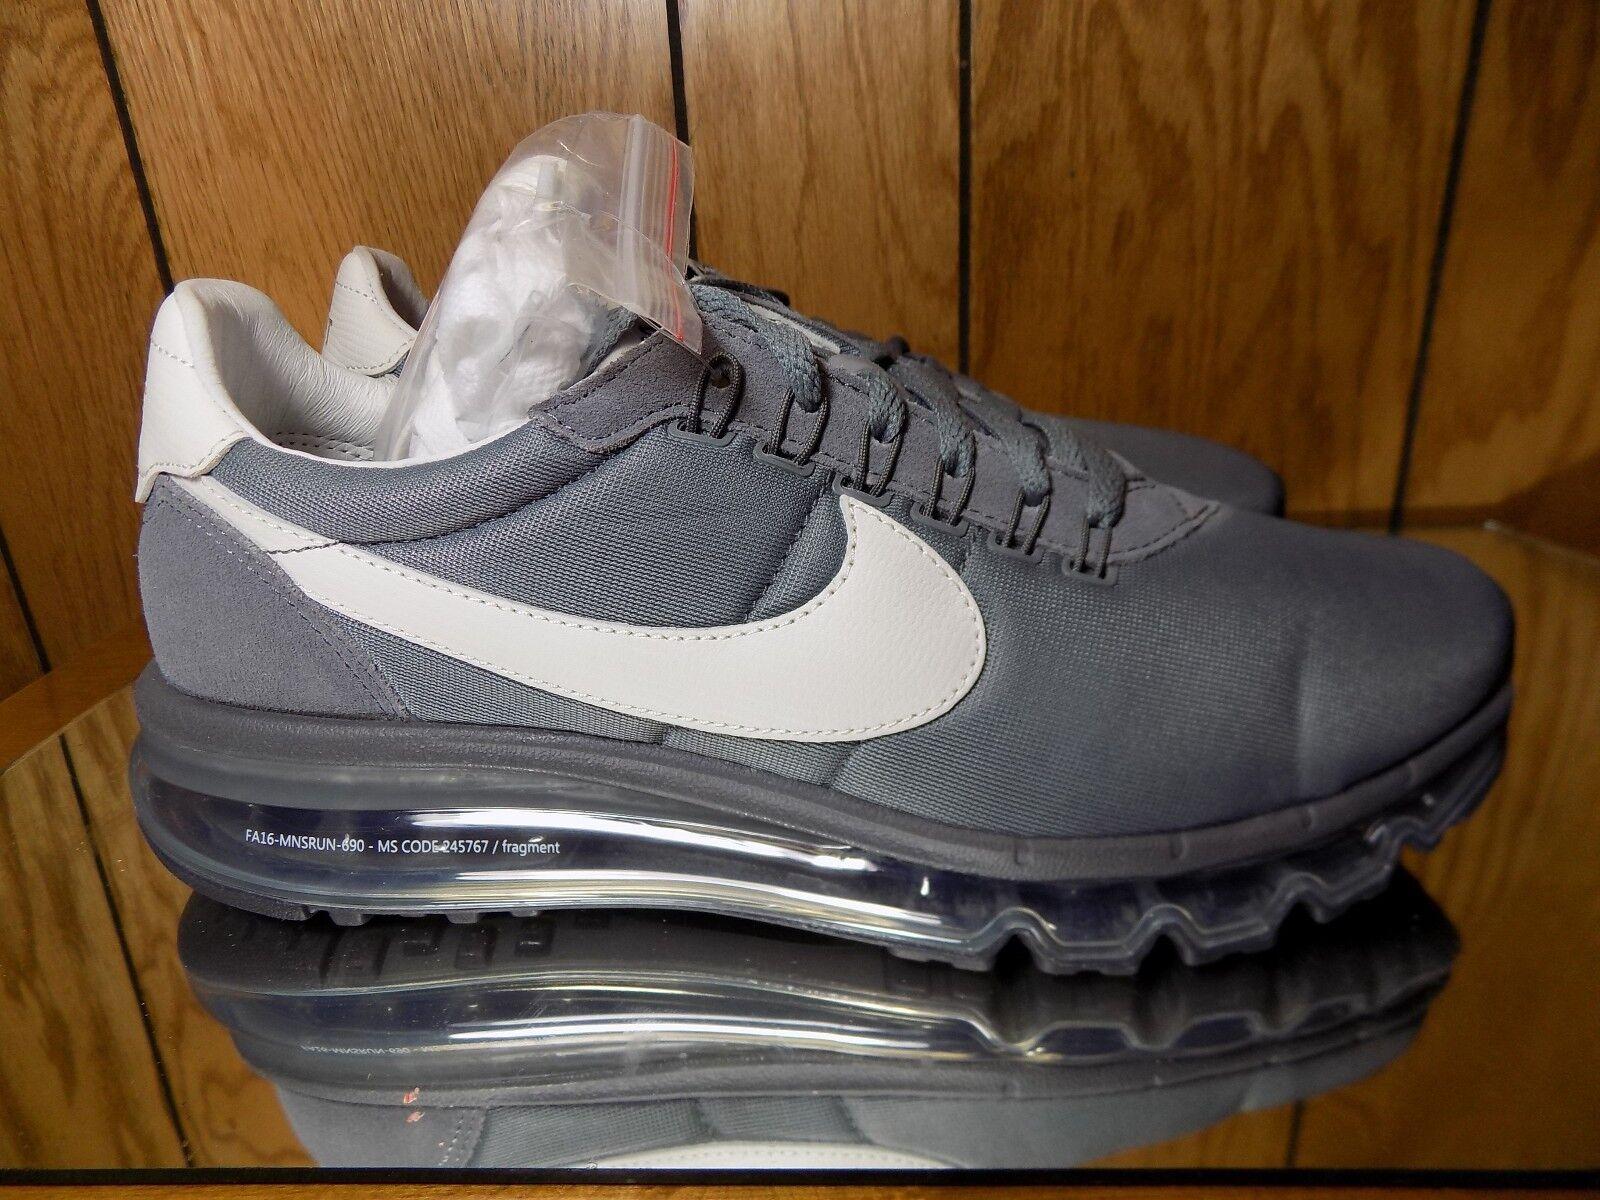 Nike Air Max Ld Zero Fragment Grey 885893 002 HTM Hiroshi Fujiwara s. 9.5